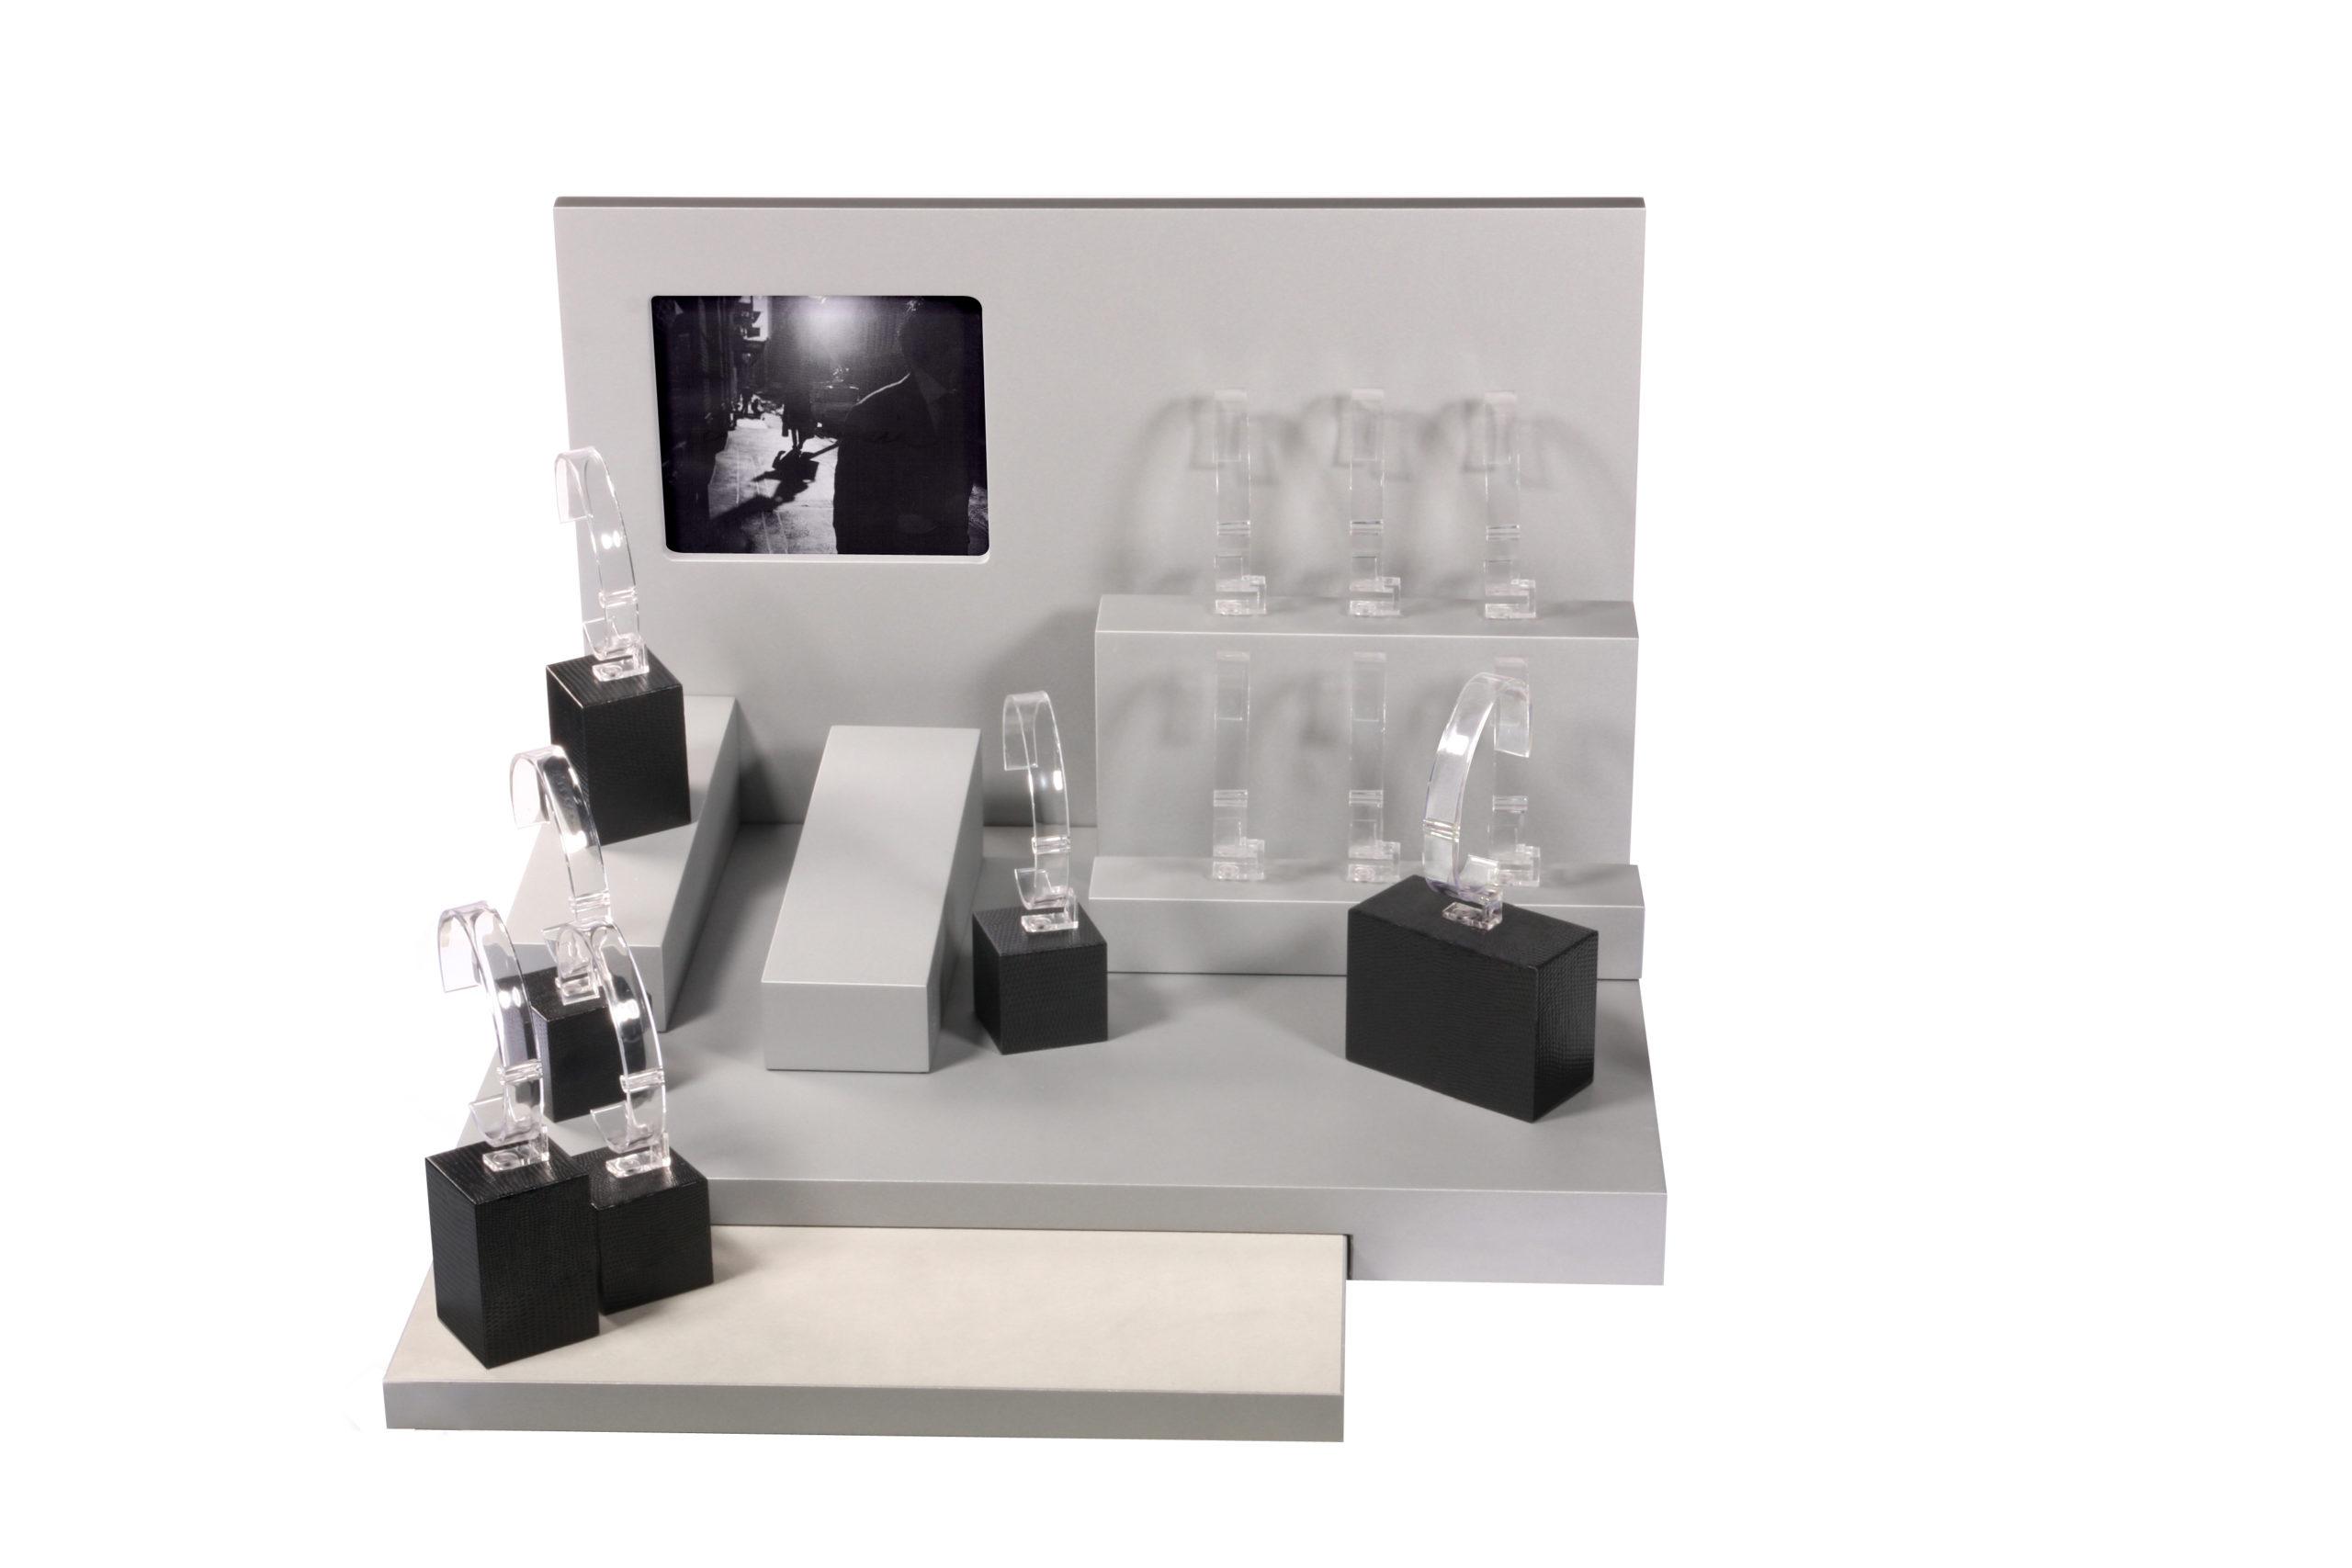 Glorybox - Display